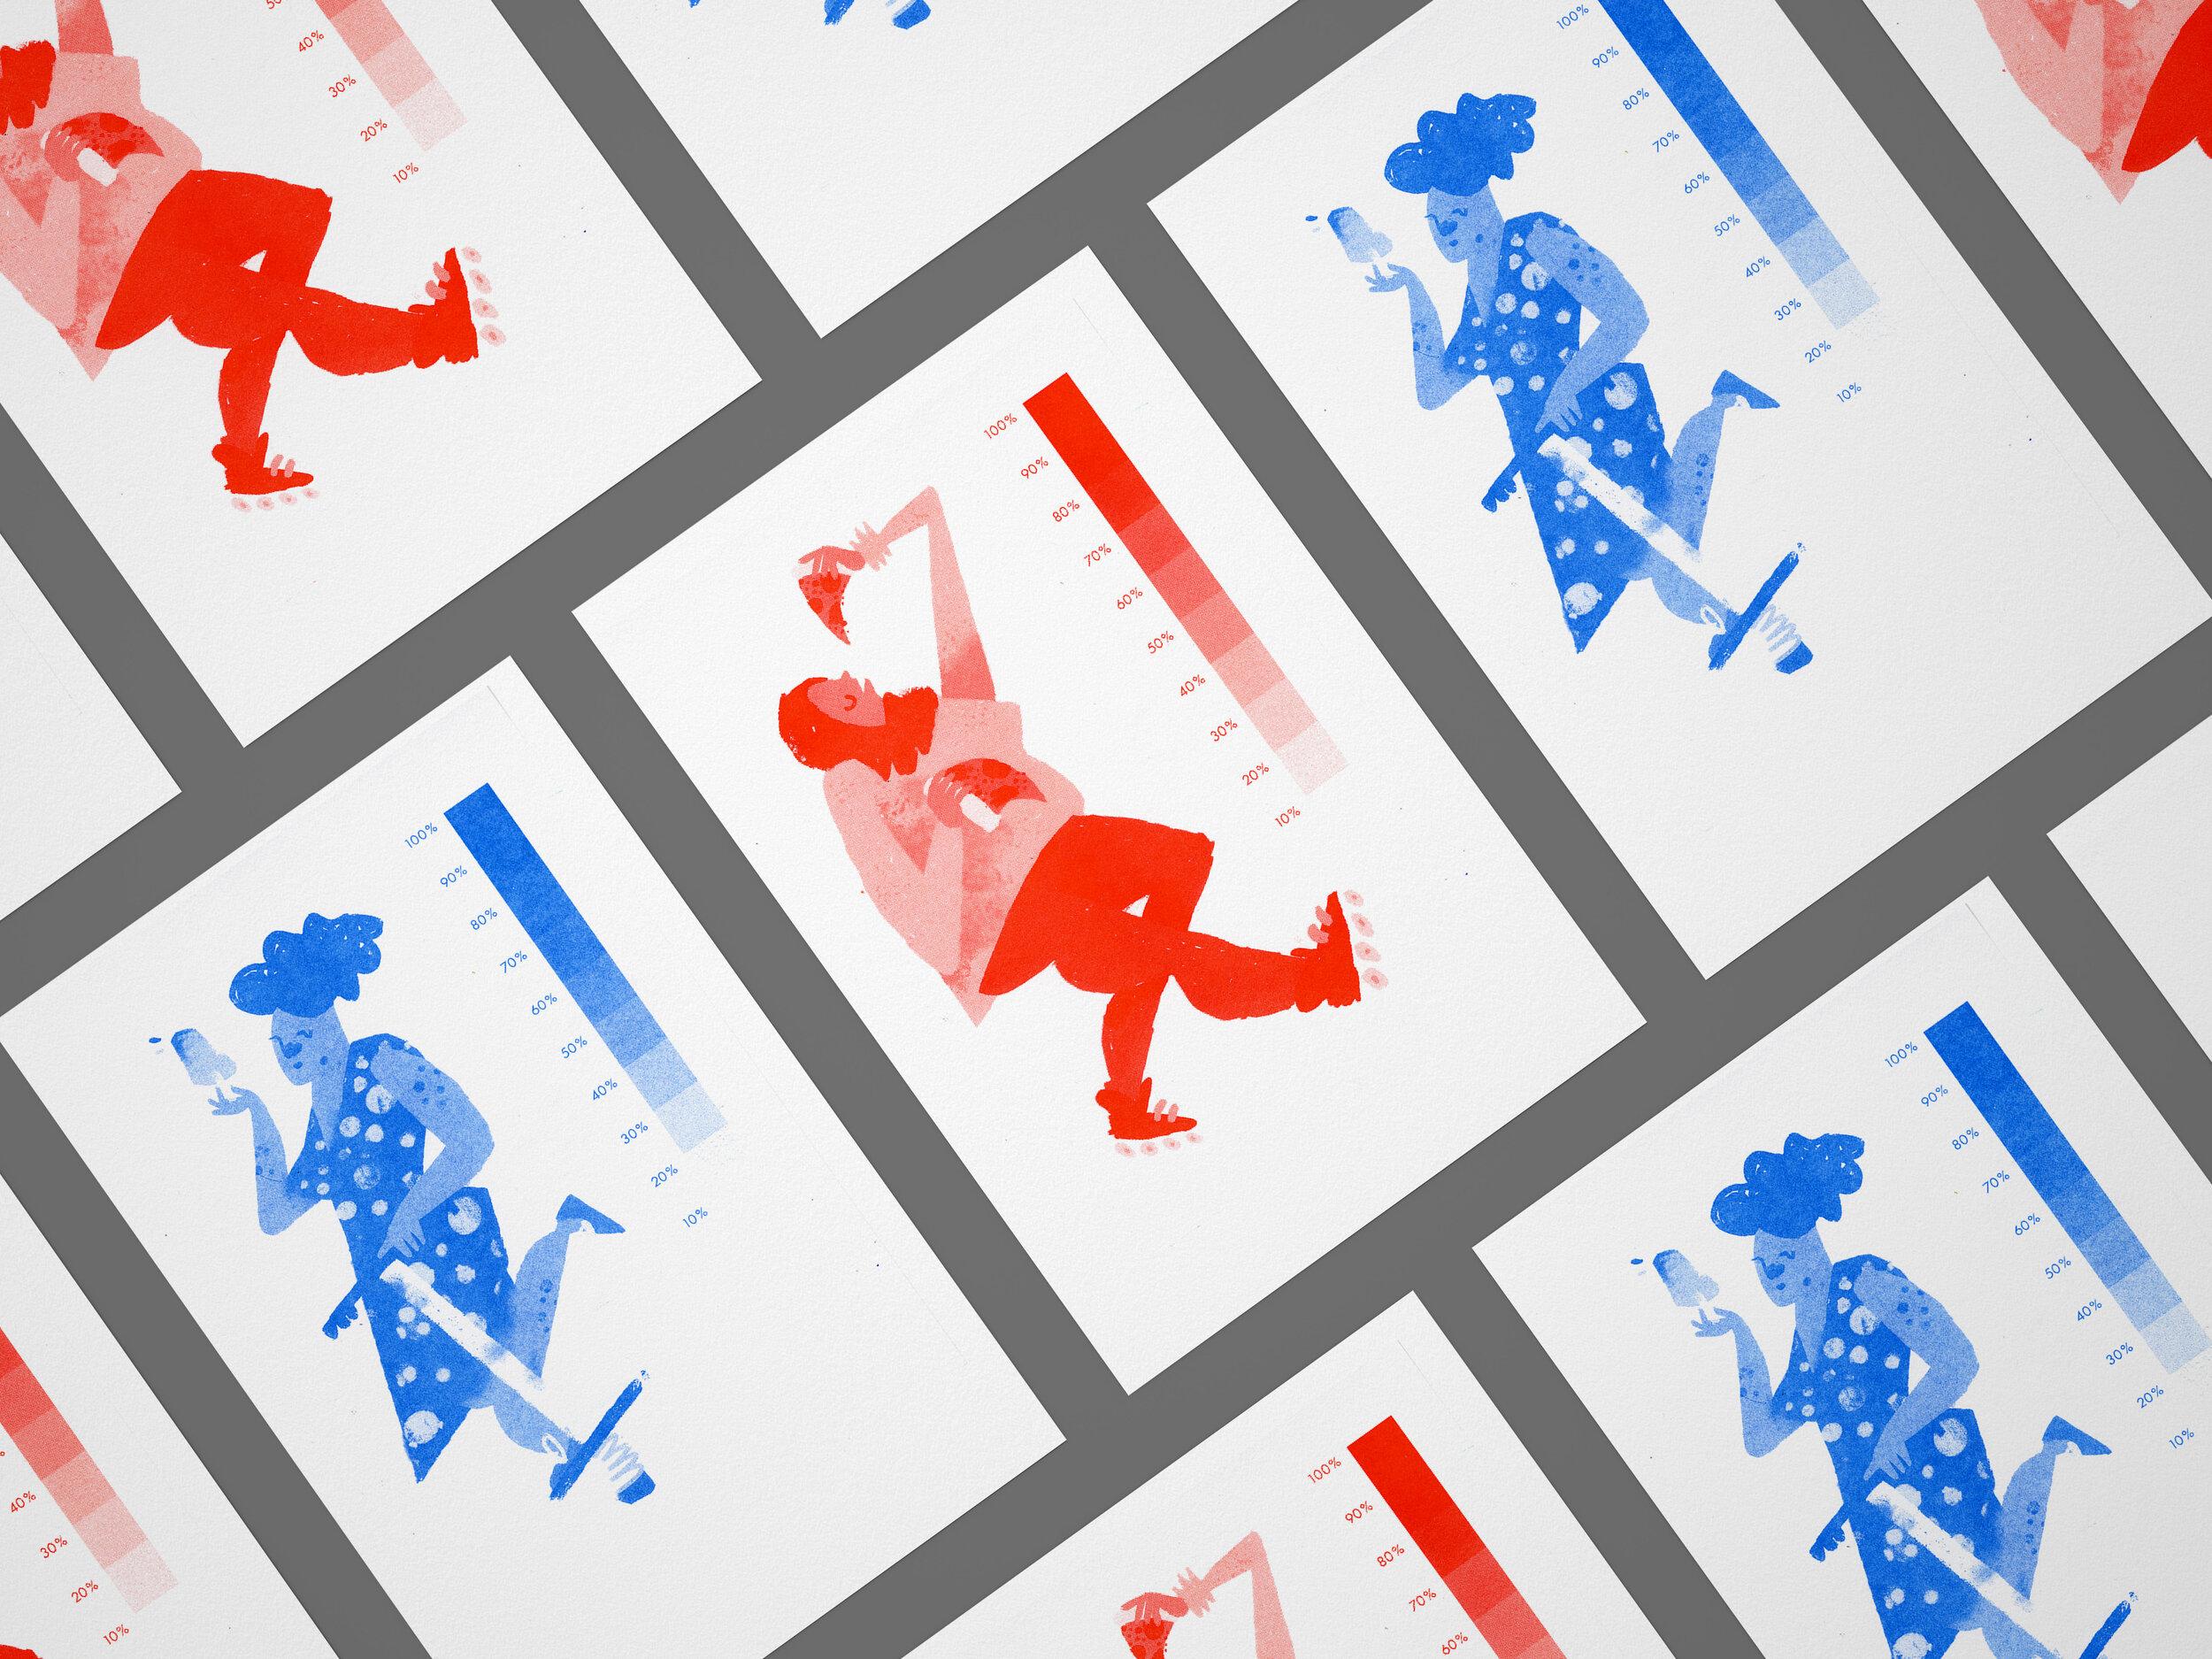 Haener_SportsnSnacks_Posters.jpg